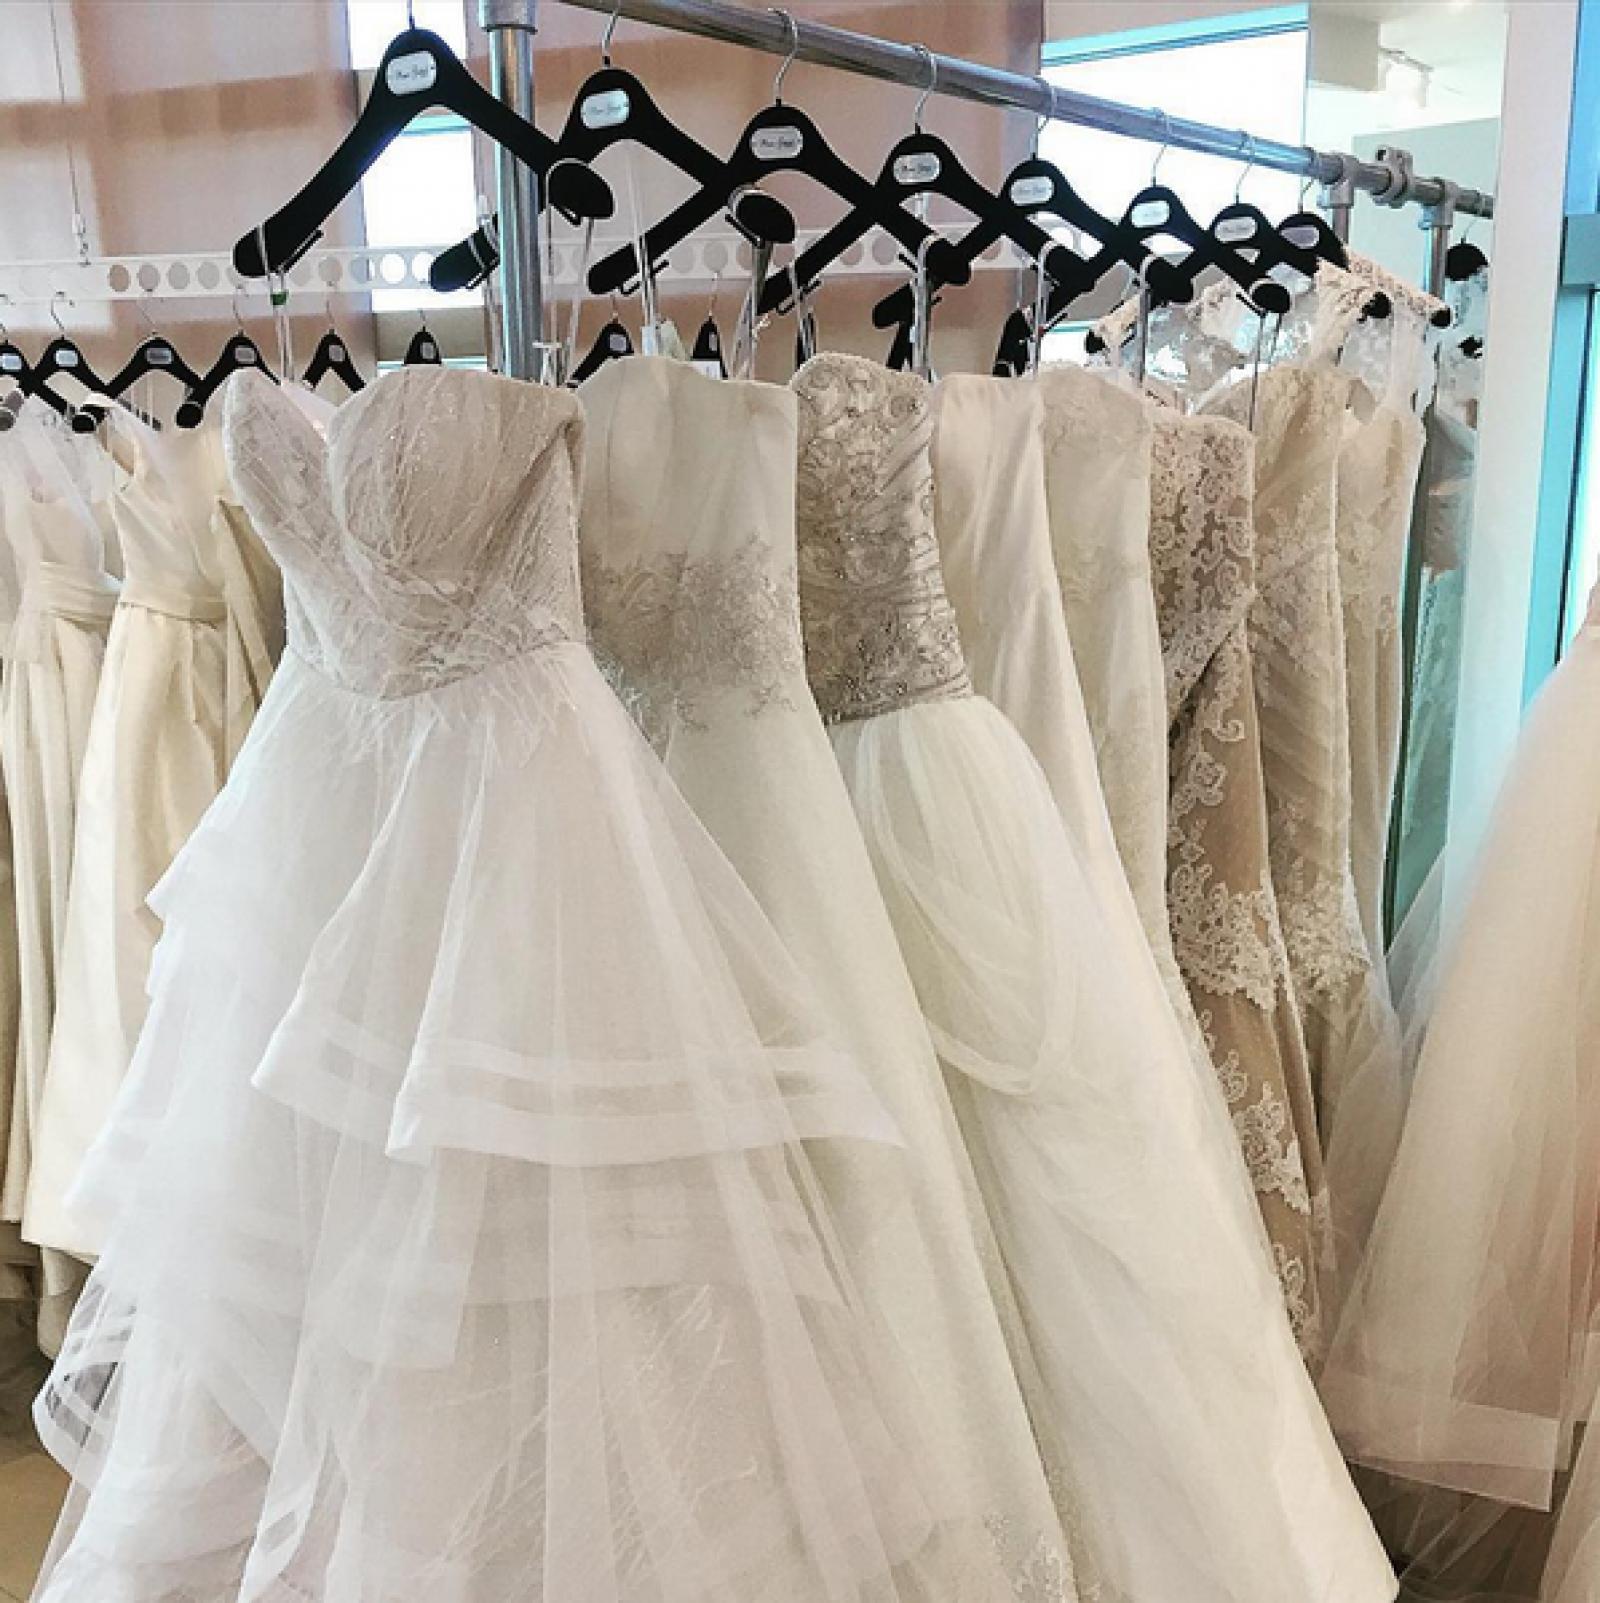 strapless wedding gowns - weddingday-online.com